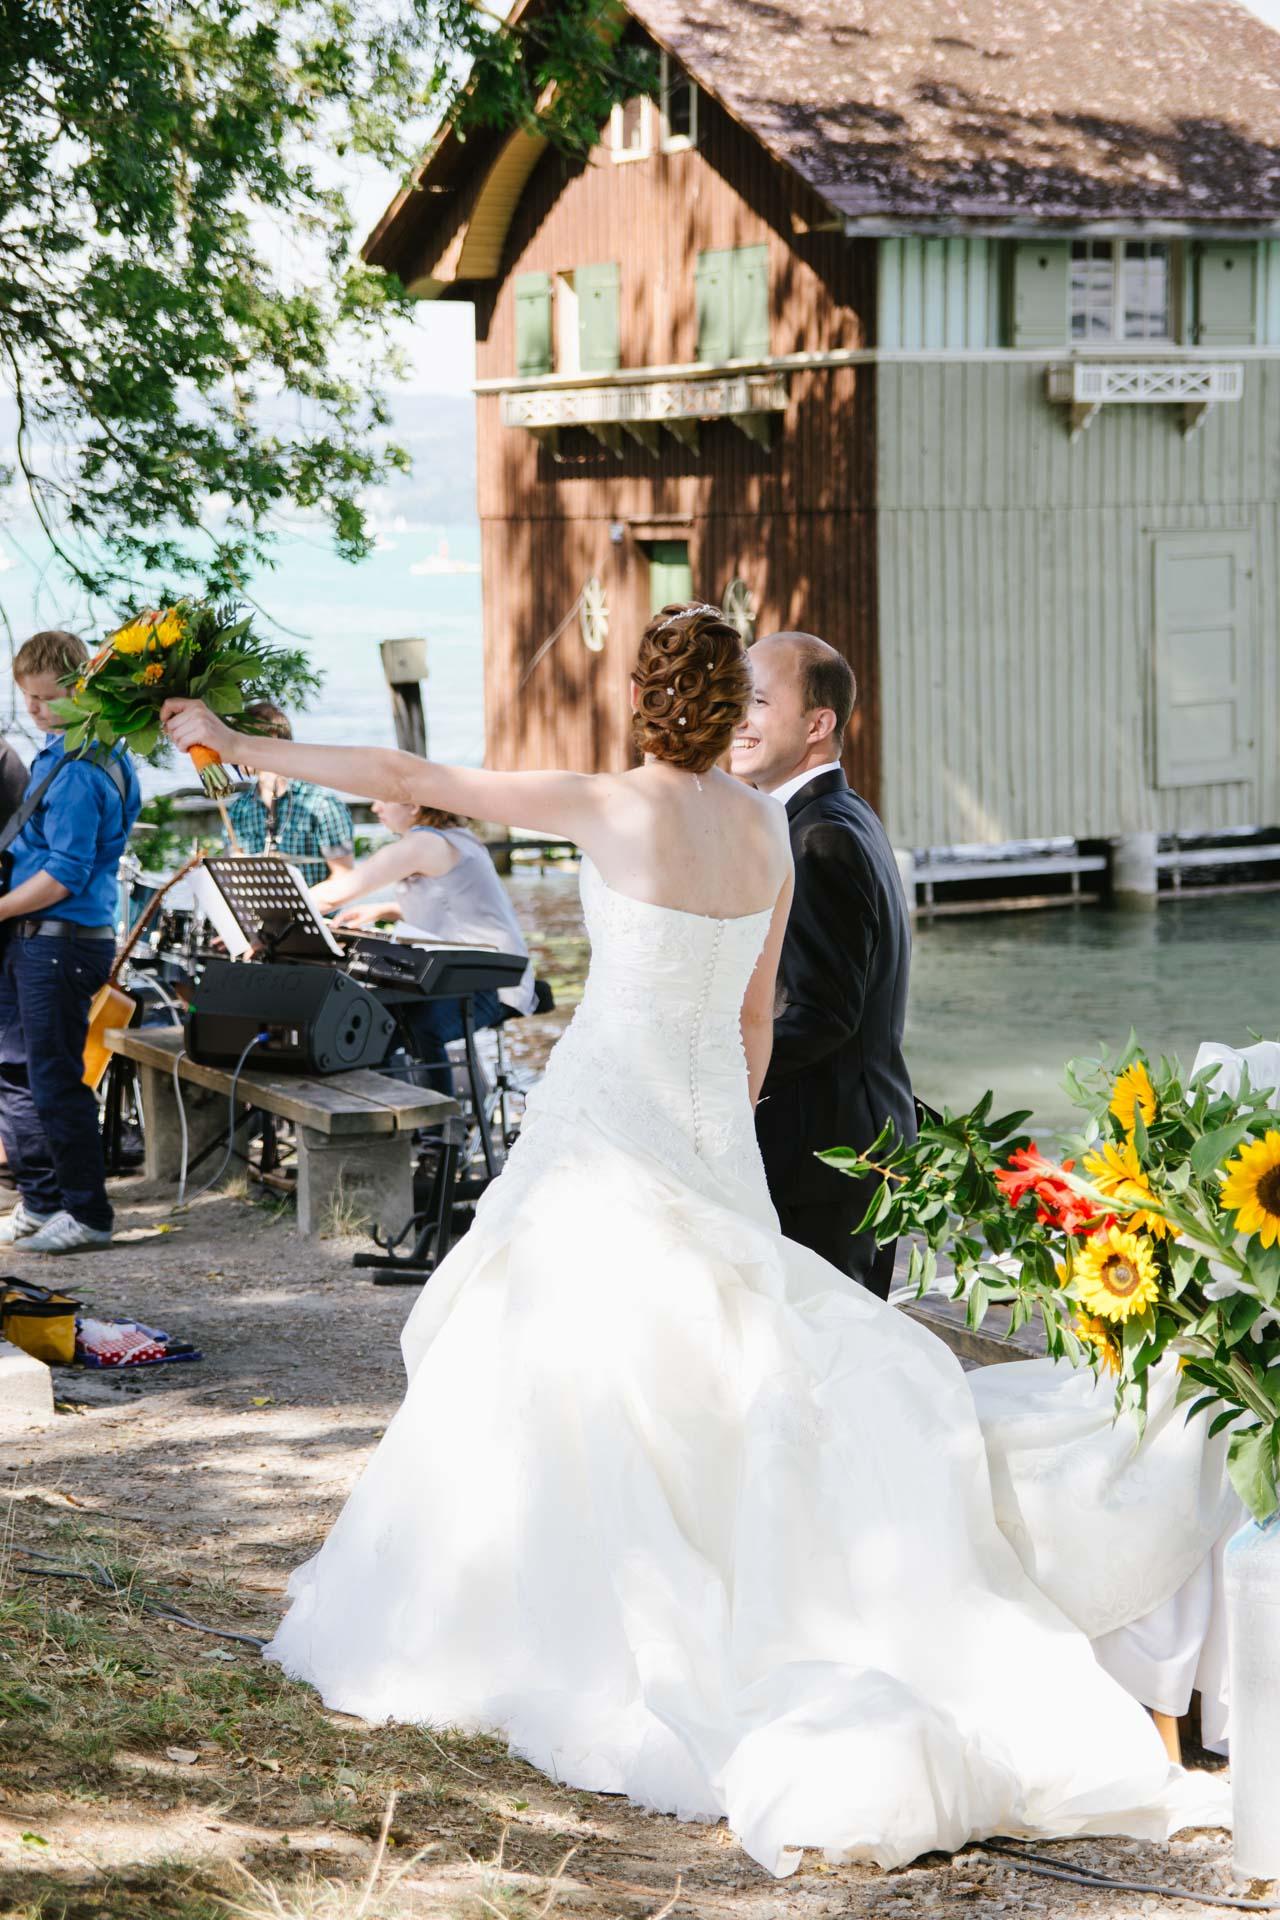 Pixelart_Hochzeitsfotografen_Loerrach_Rheinfelden_Hallwil_Schweiz_Linda-Ramon-1027